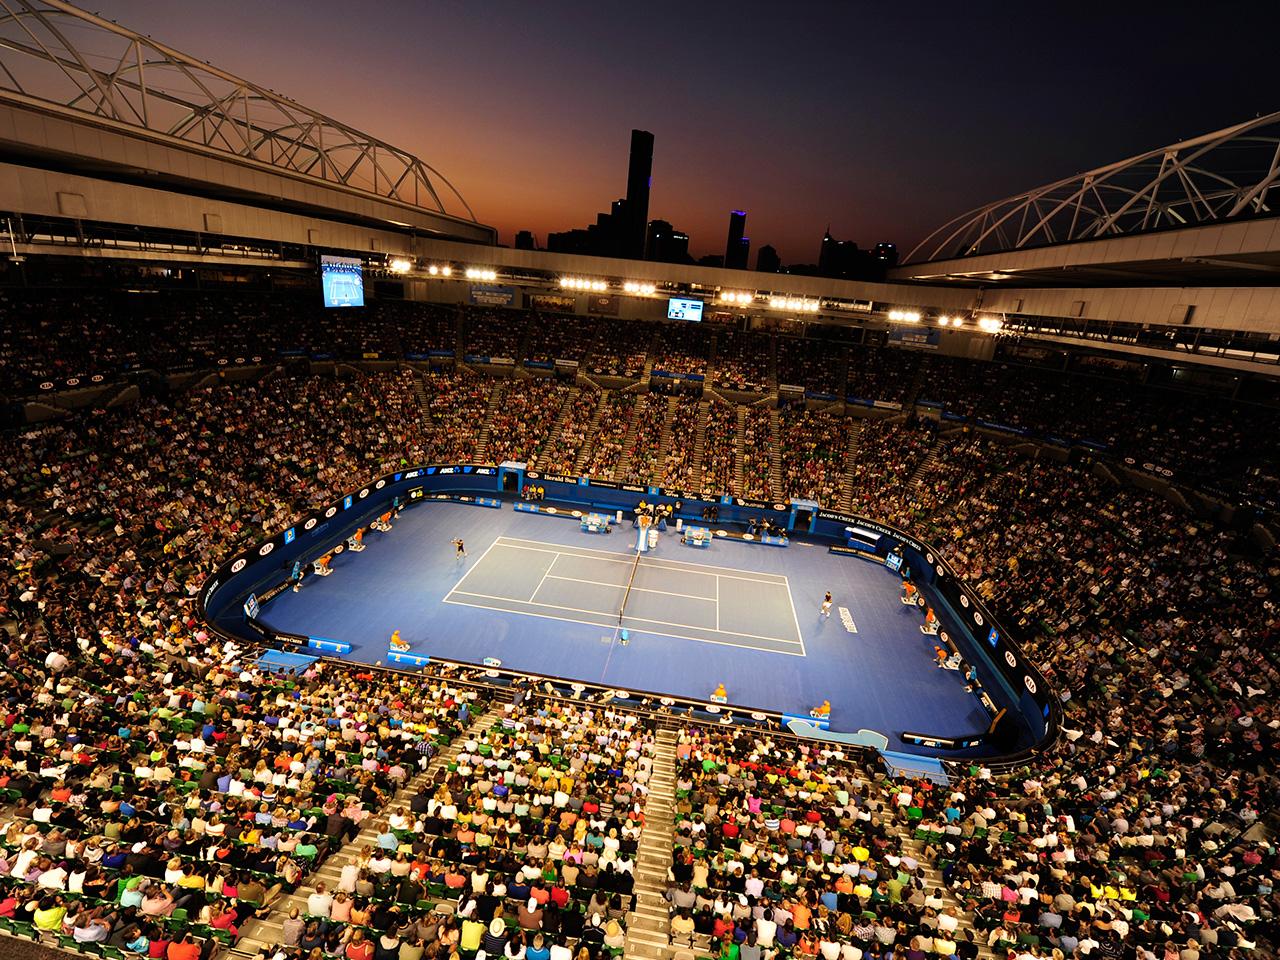 Melbourne's Moment: The Australian Open